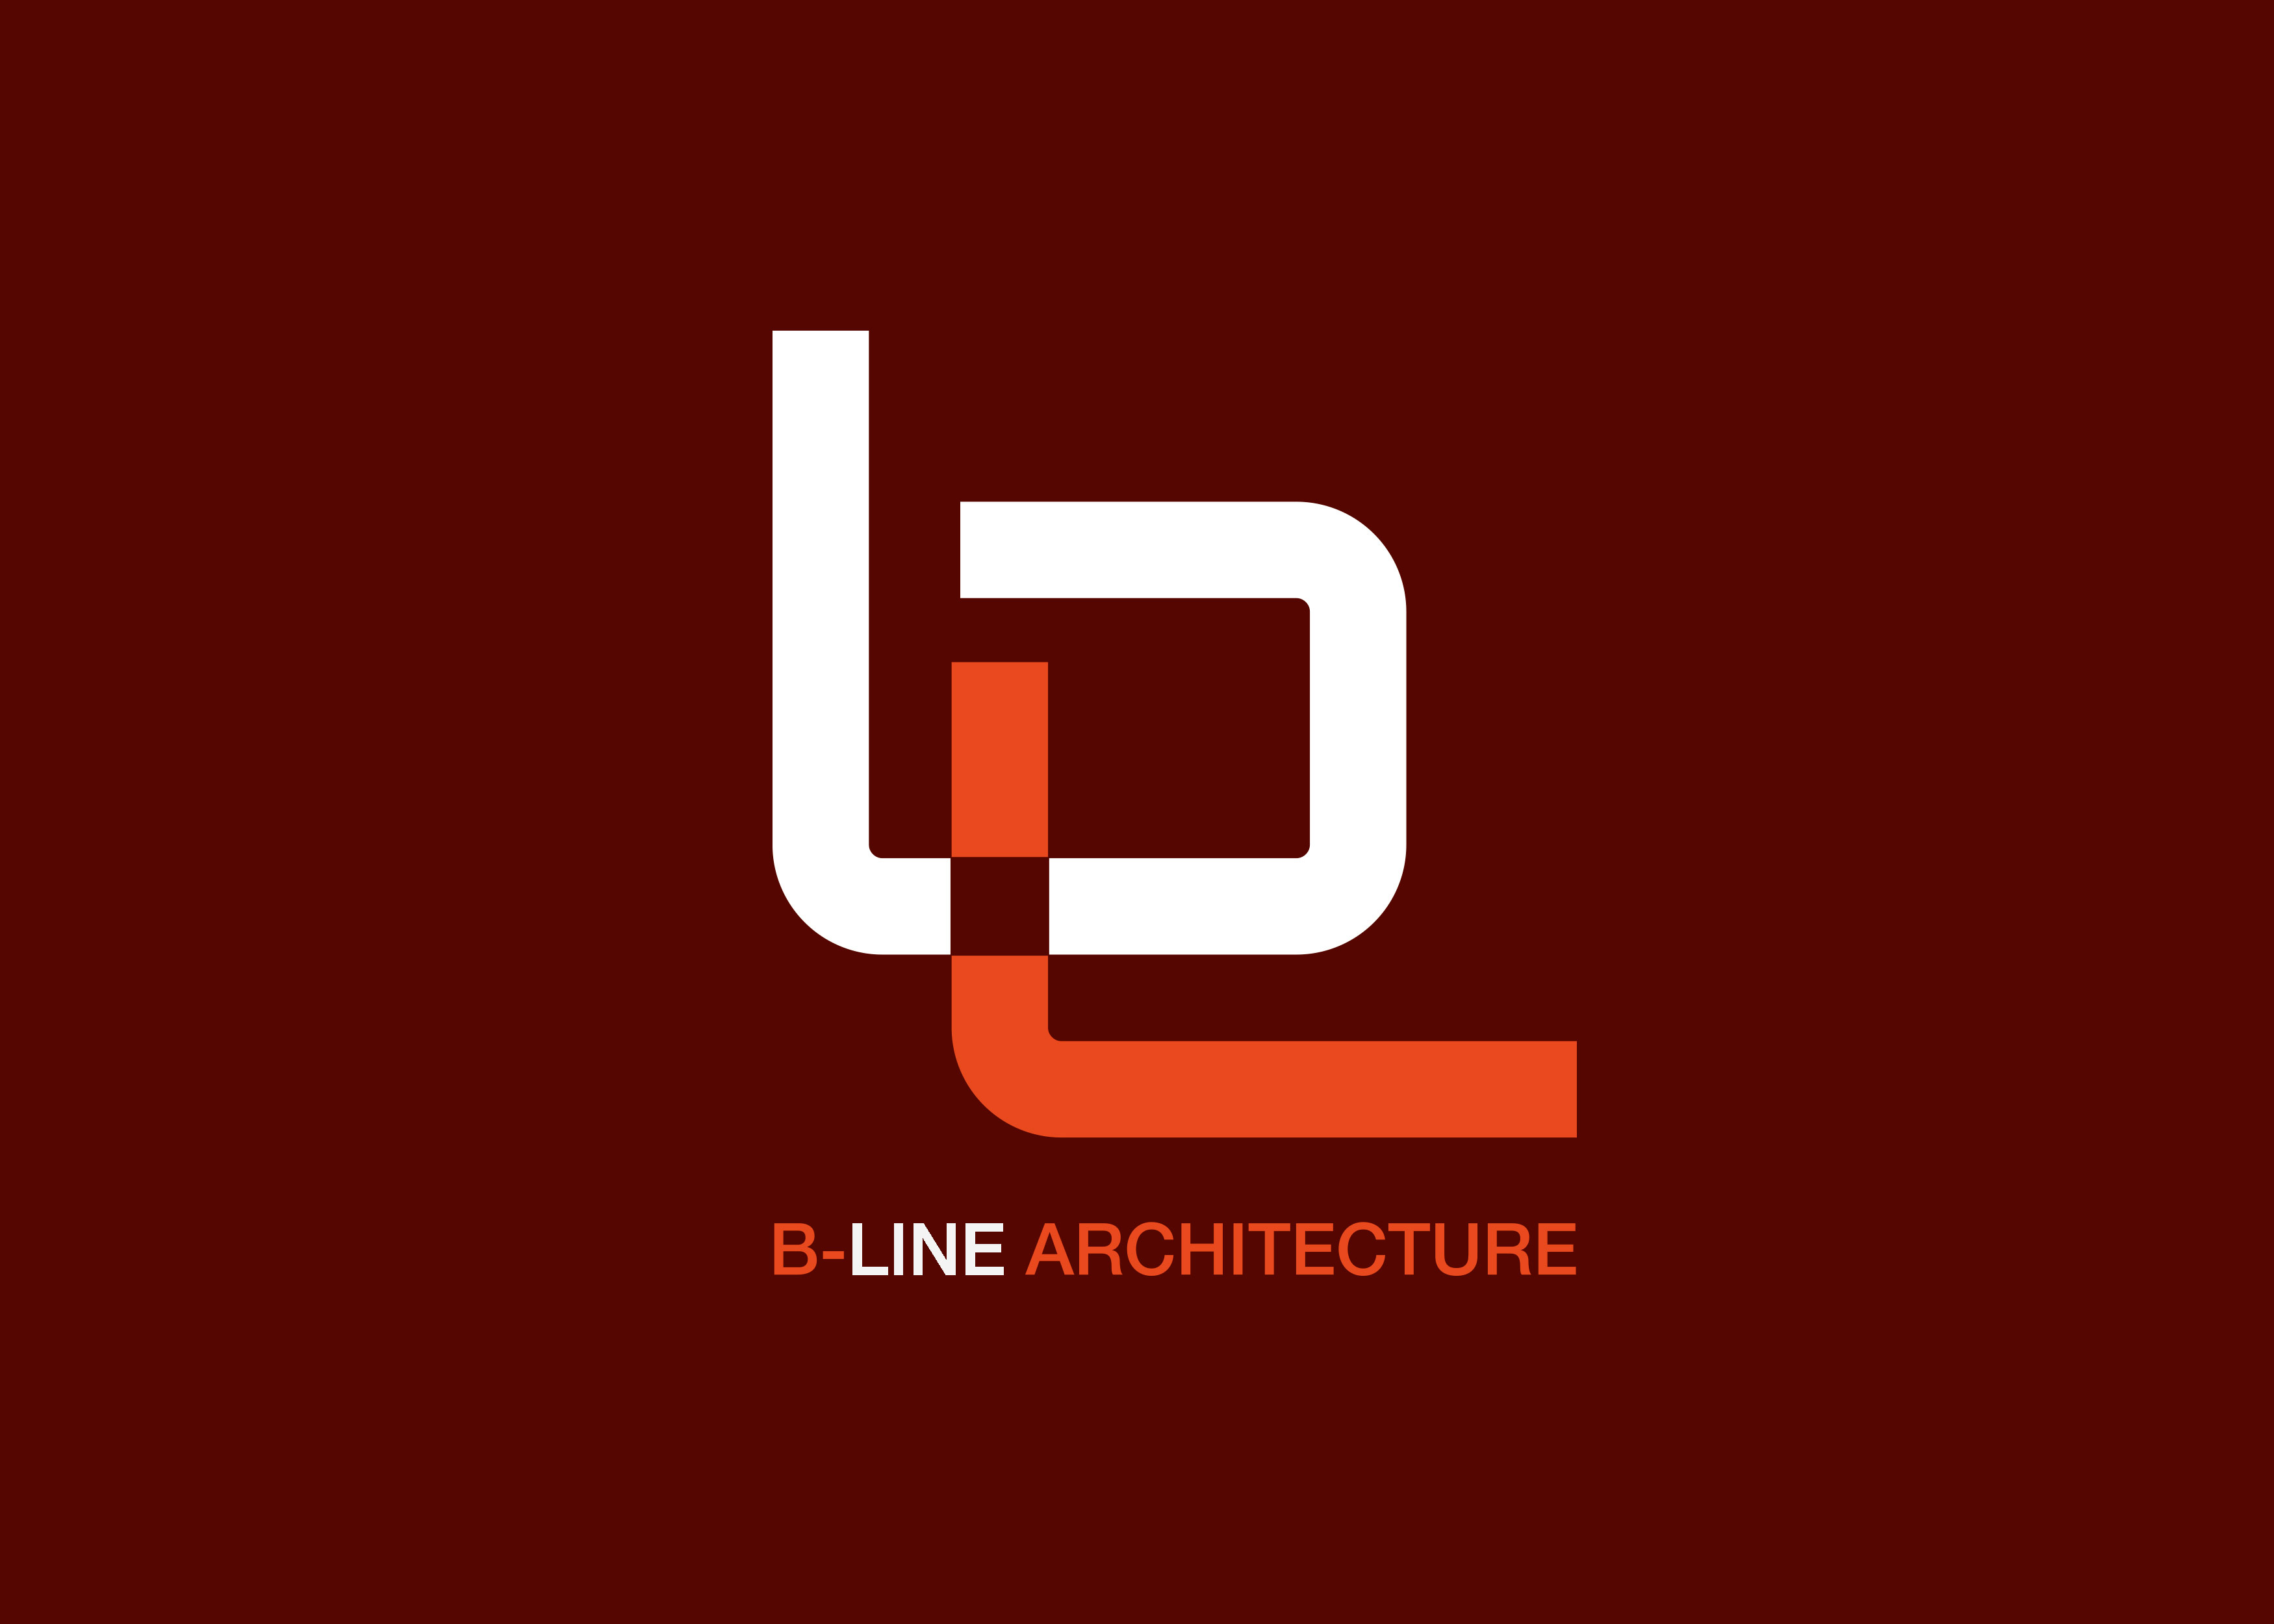 B-Line Architecture - Brand Identity